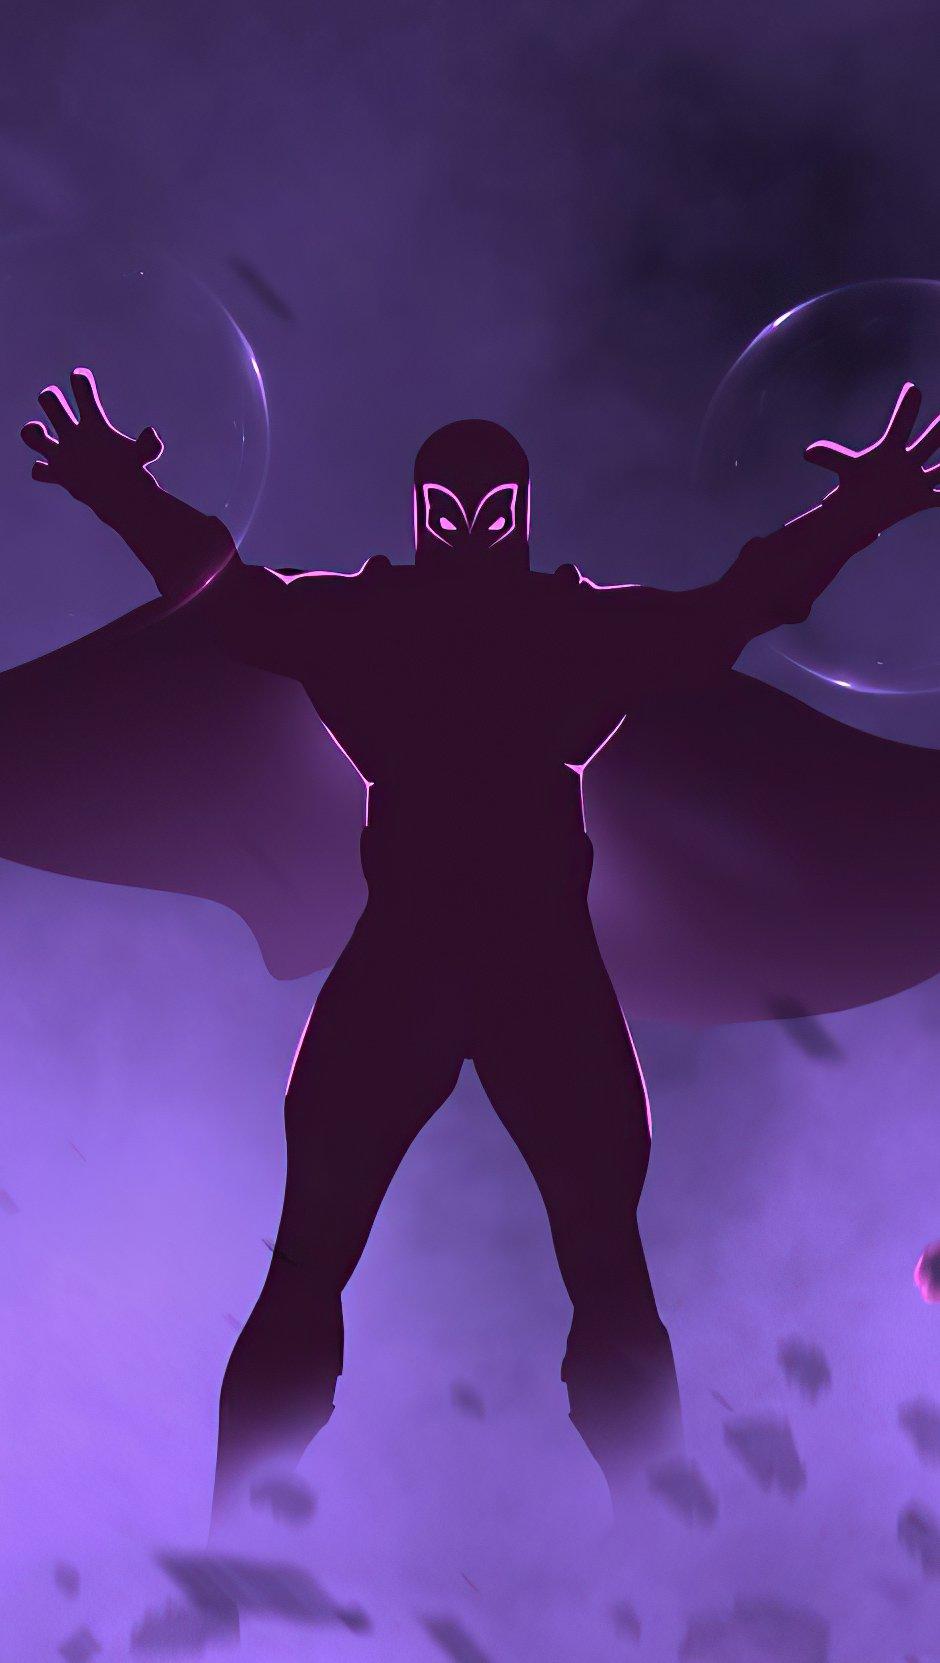 Wallpaper Magneto 2020 Vertical